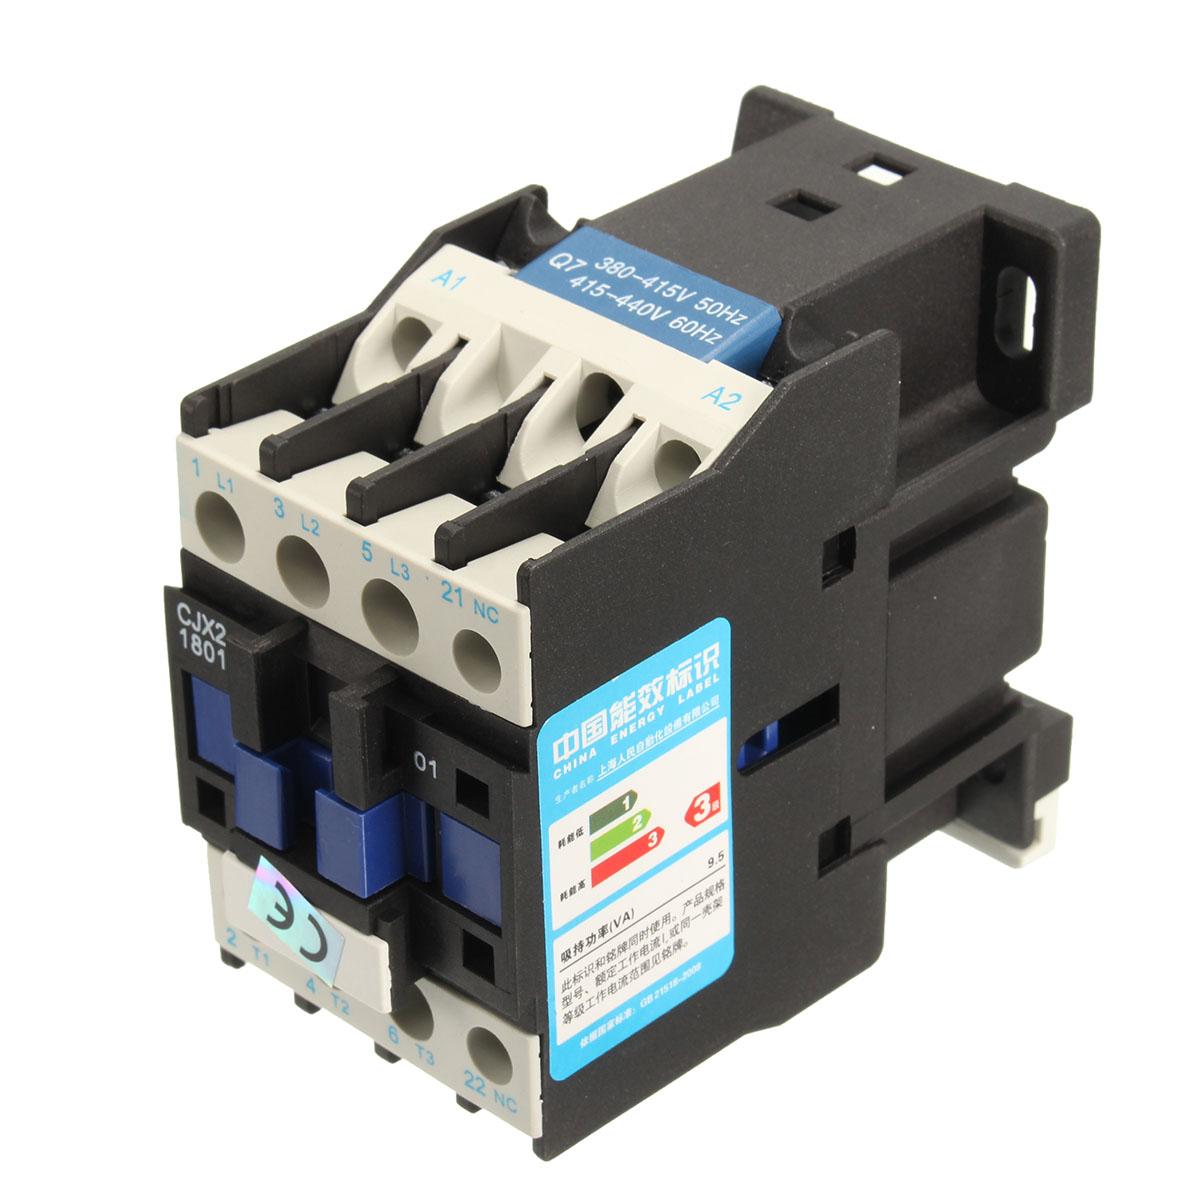 Single Phase Motor Wiring Diagrams Besides 220 Volt 3 Phase Motor